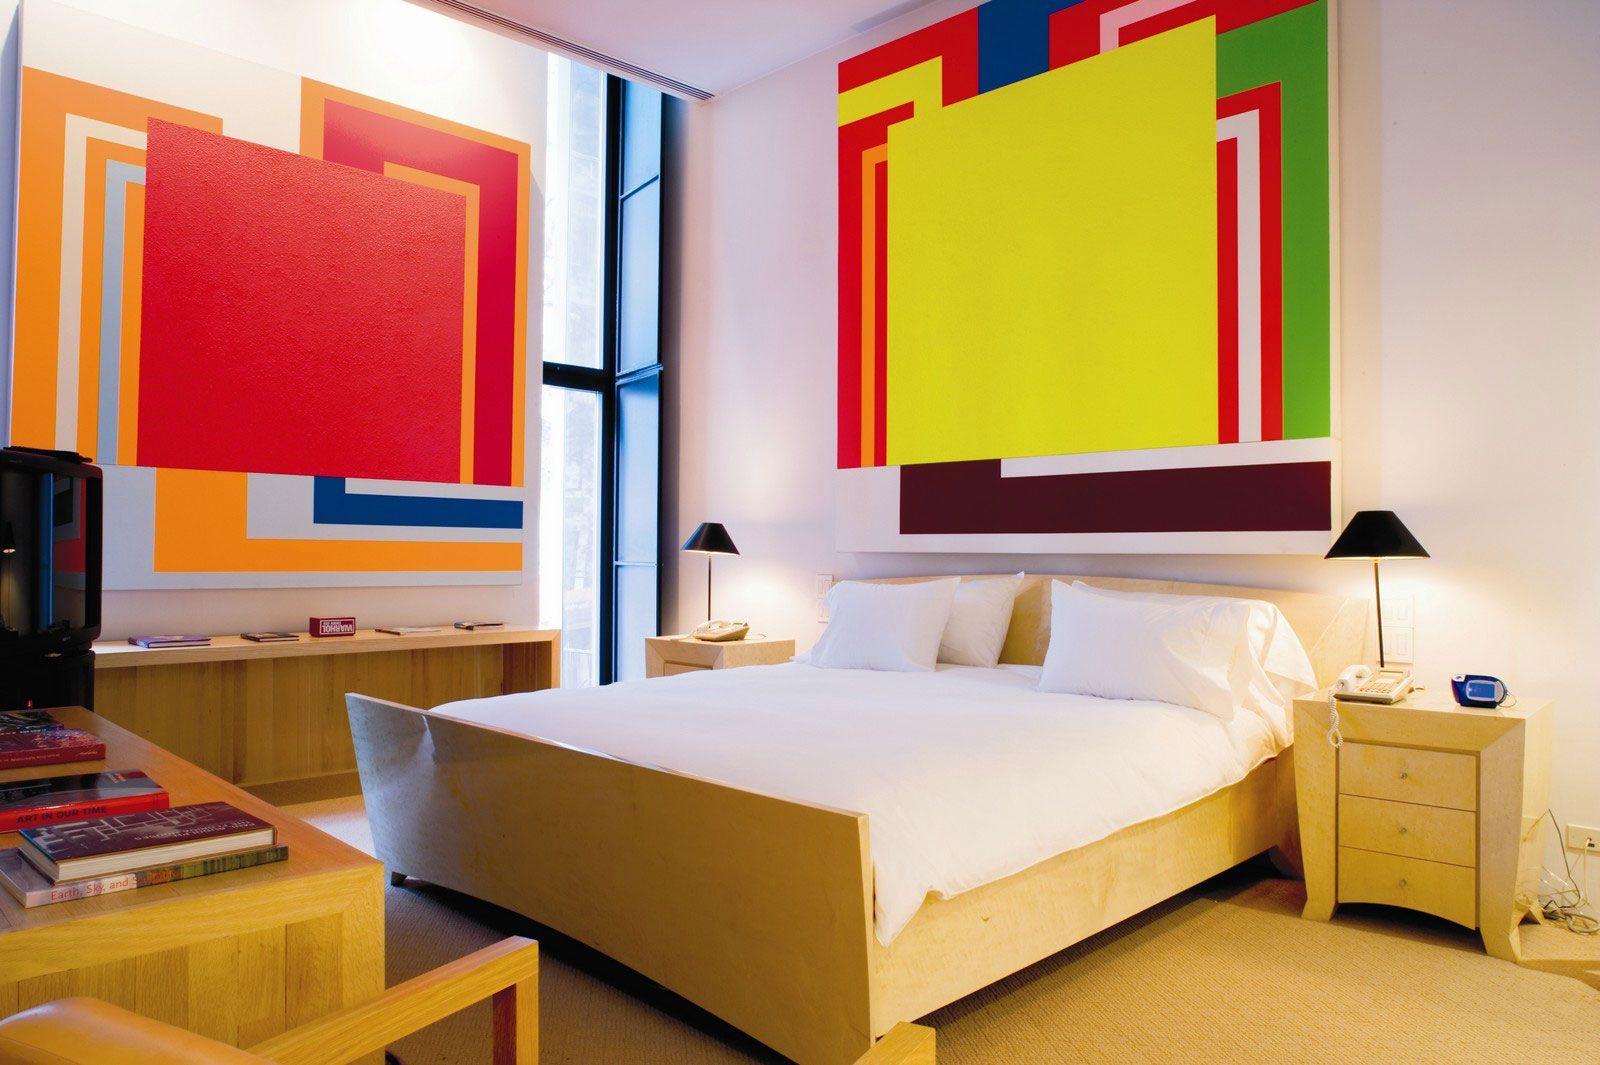 modern urban retreat in new york city by paul rudolph - caandesign, Innenarchitektur ideen